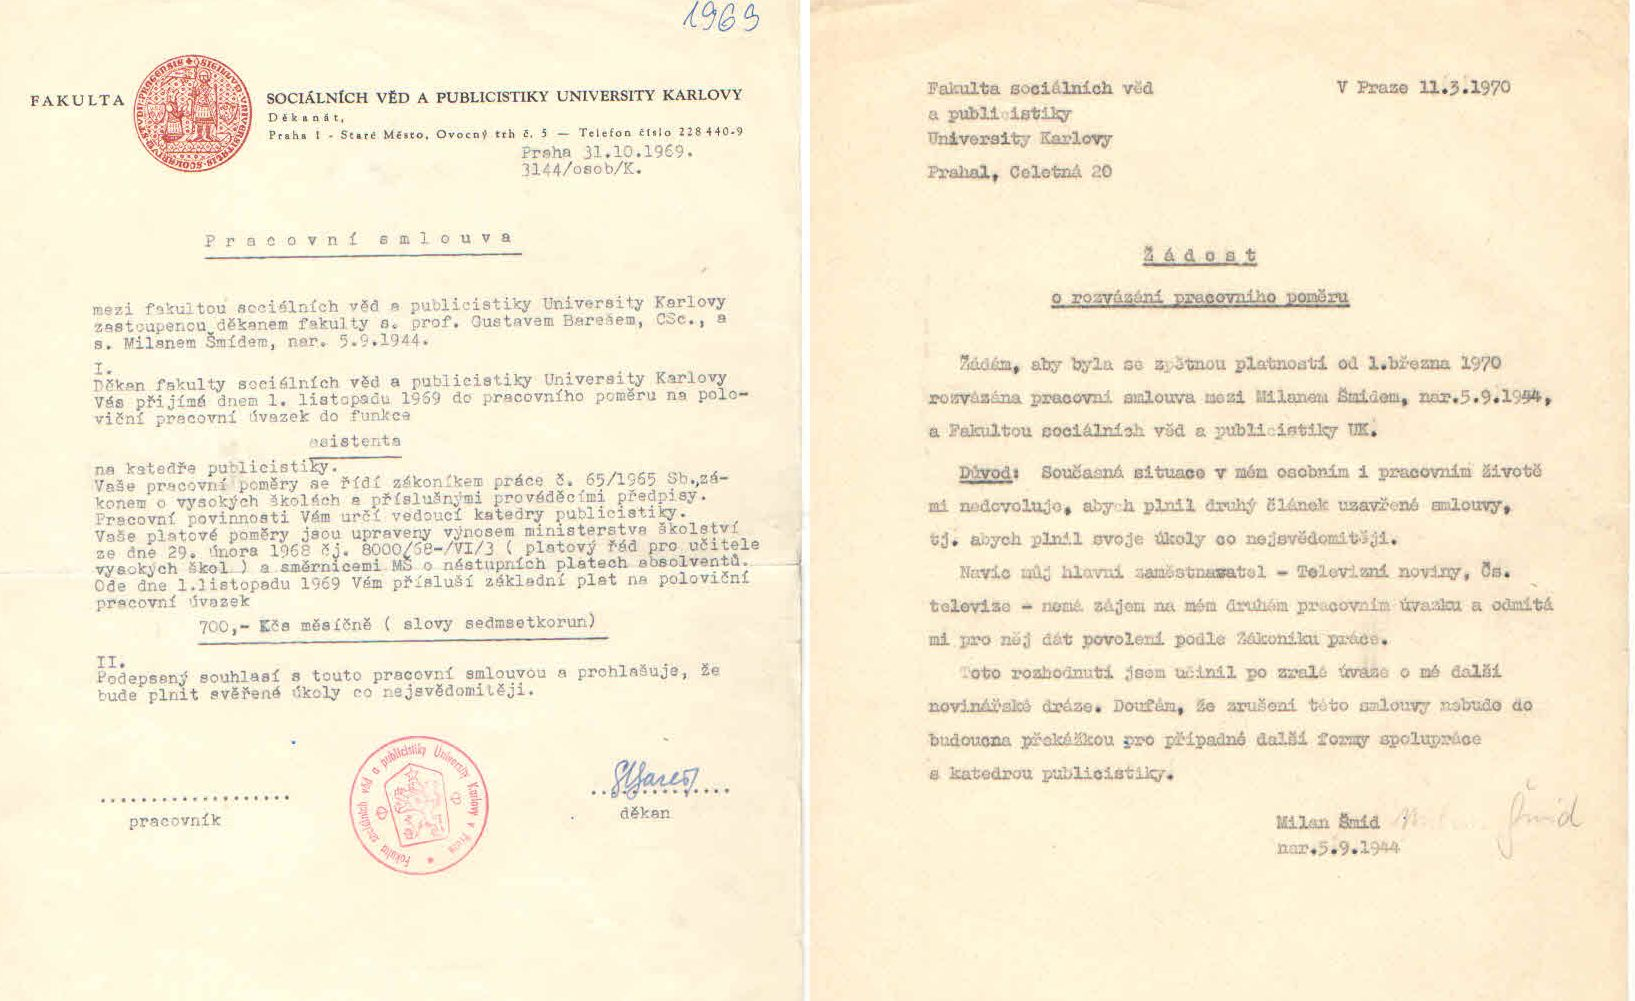 Smlouva FSV UK - asistent 1969-70